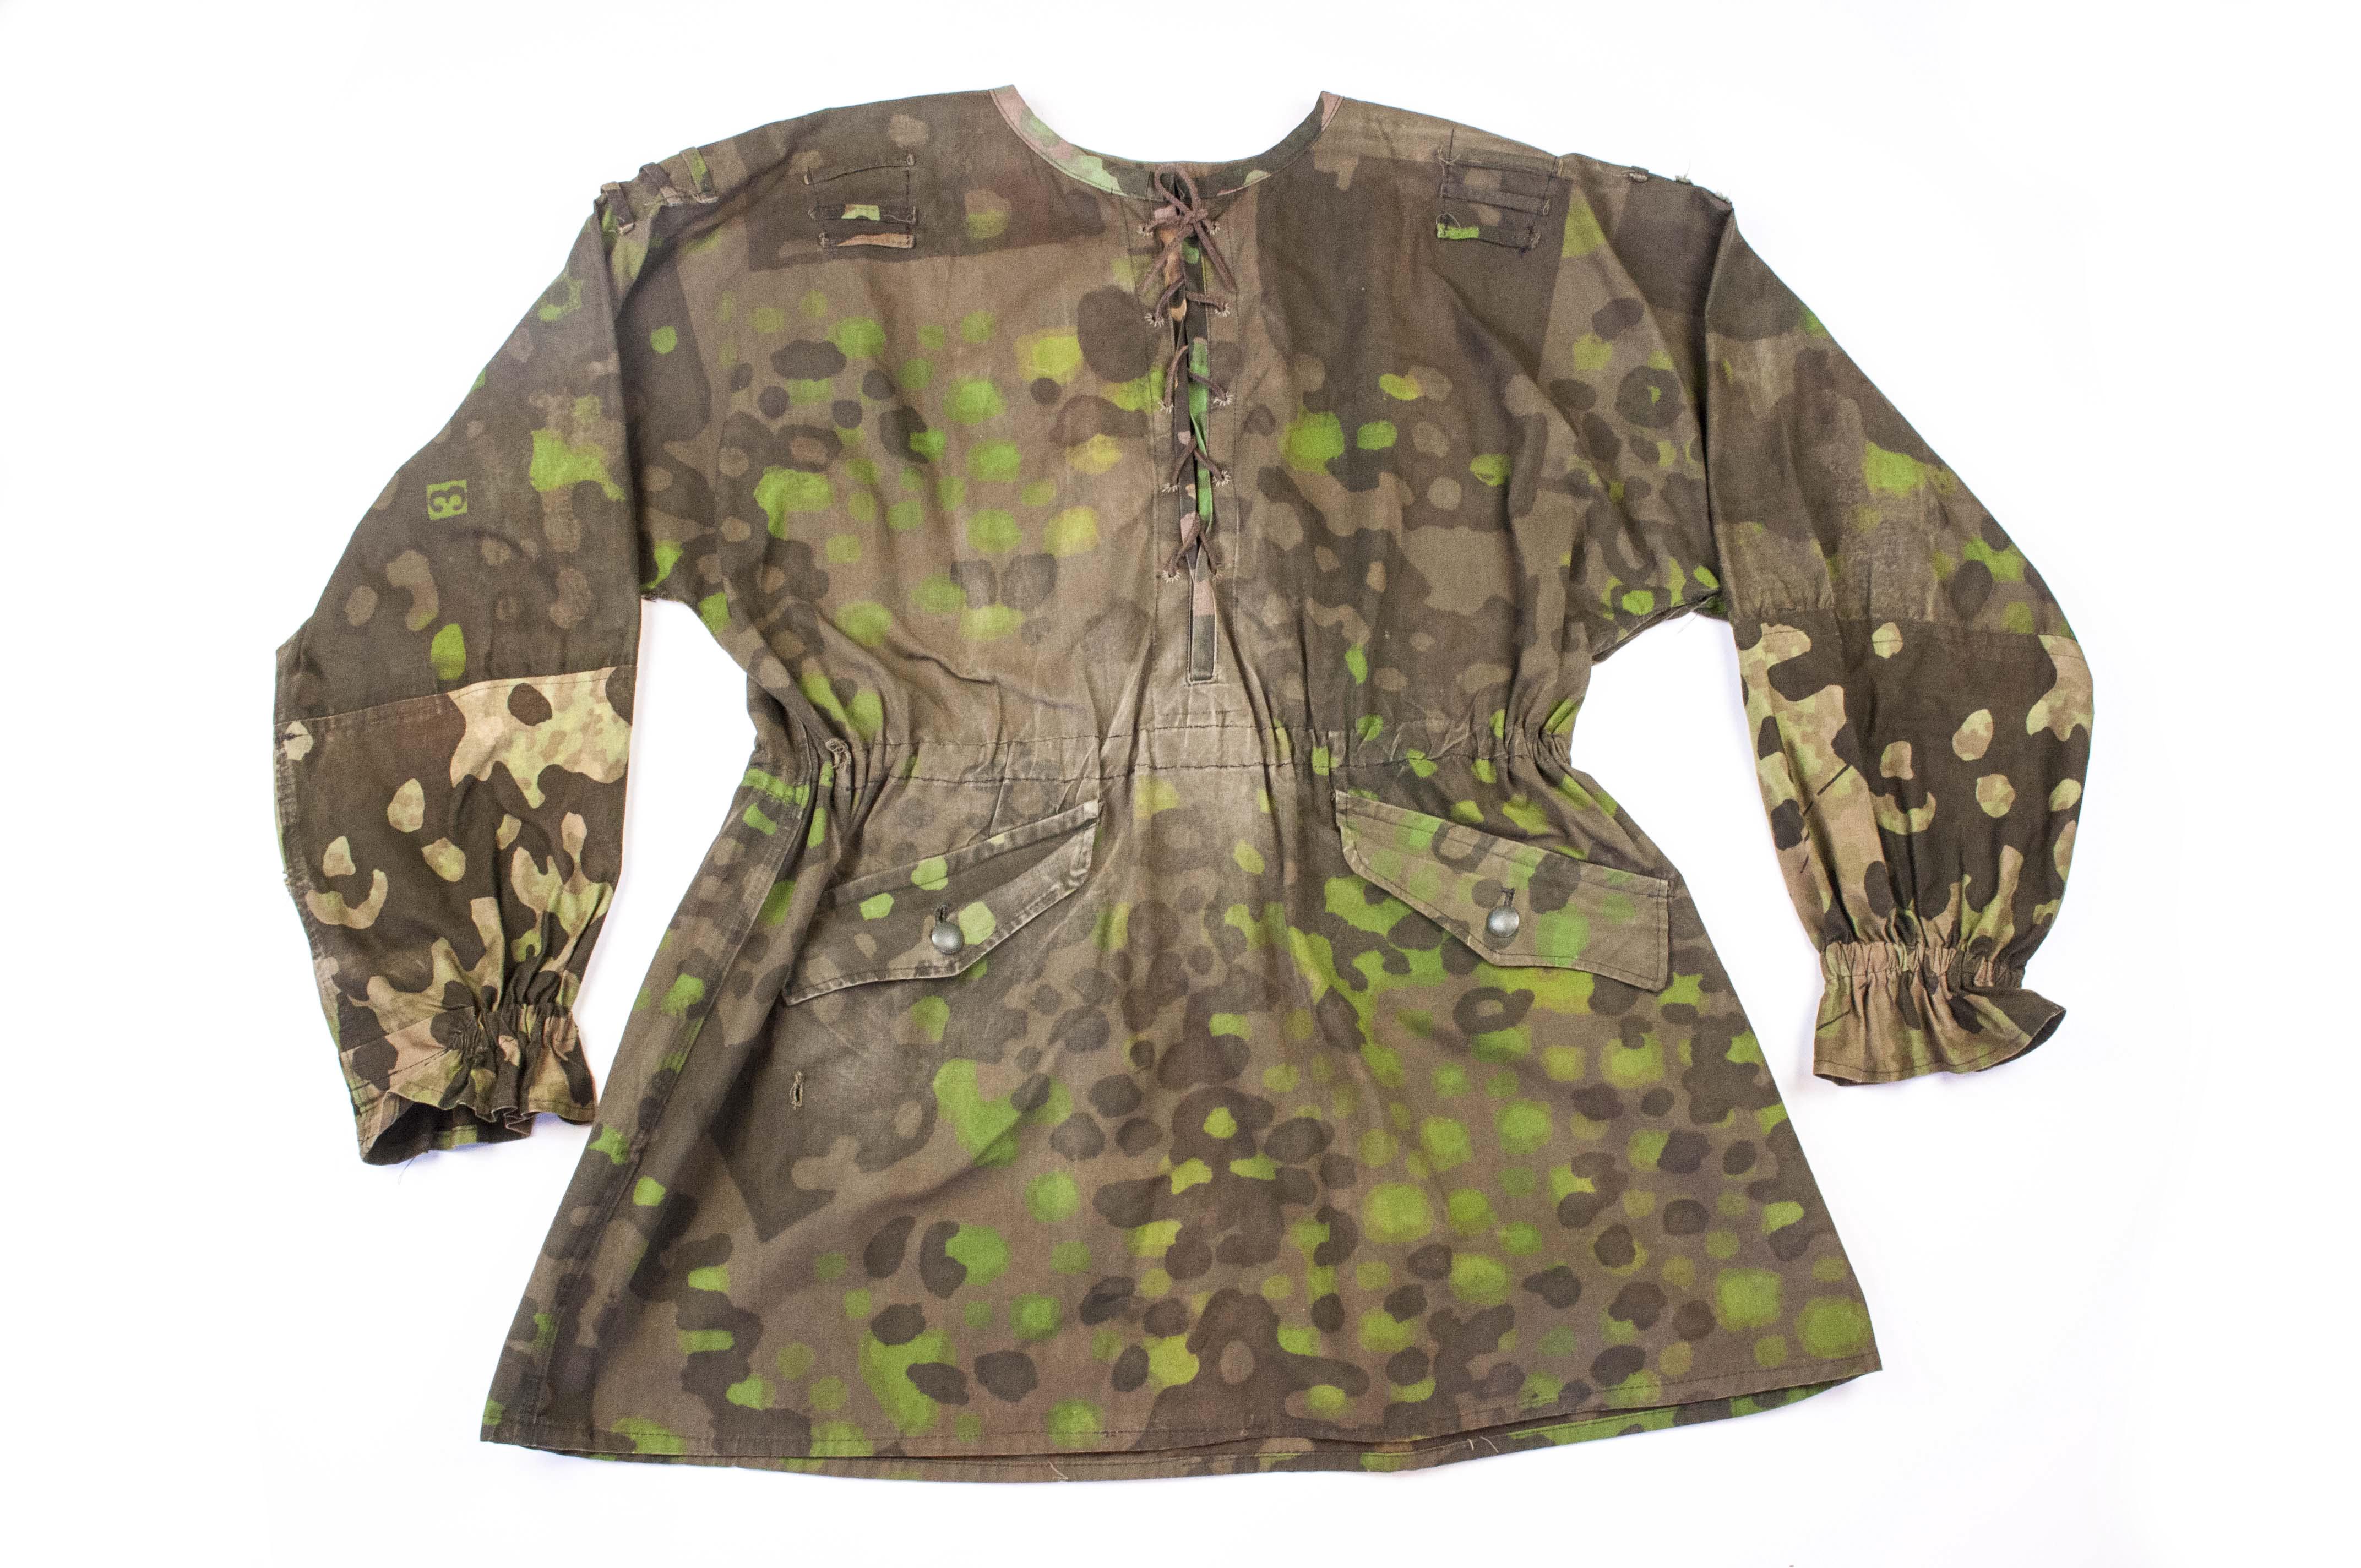 M42 Camouflage Smock Waffen Ss Plane Tree 3 4 Fjm44